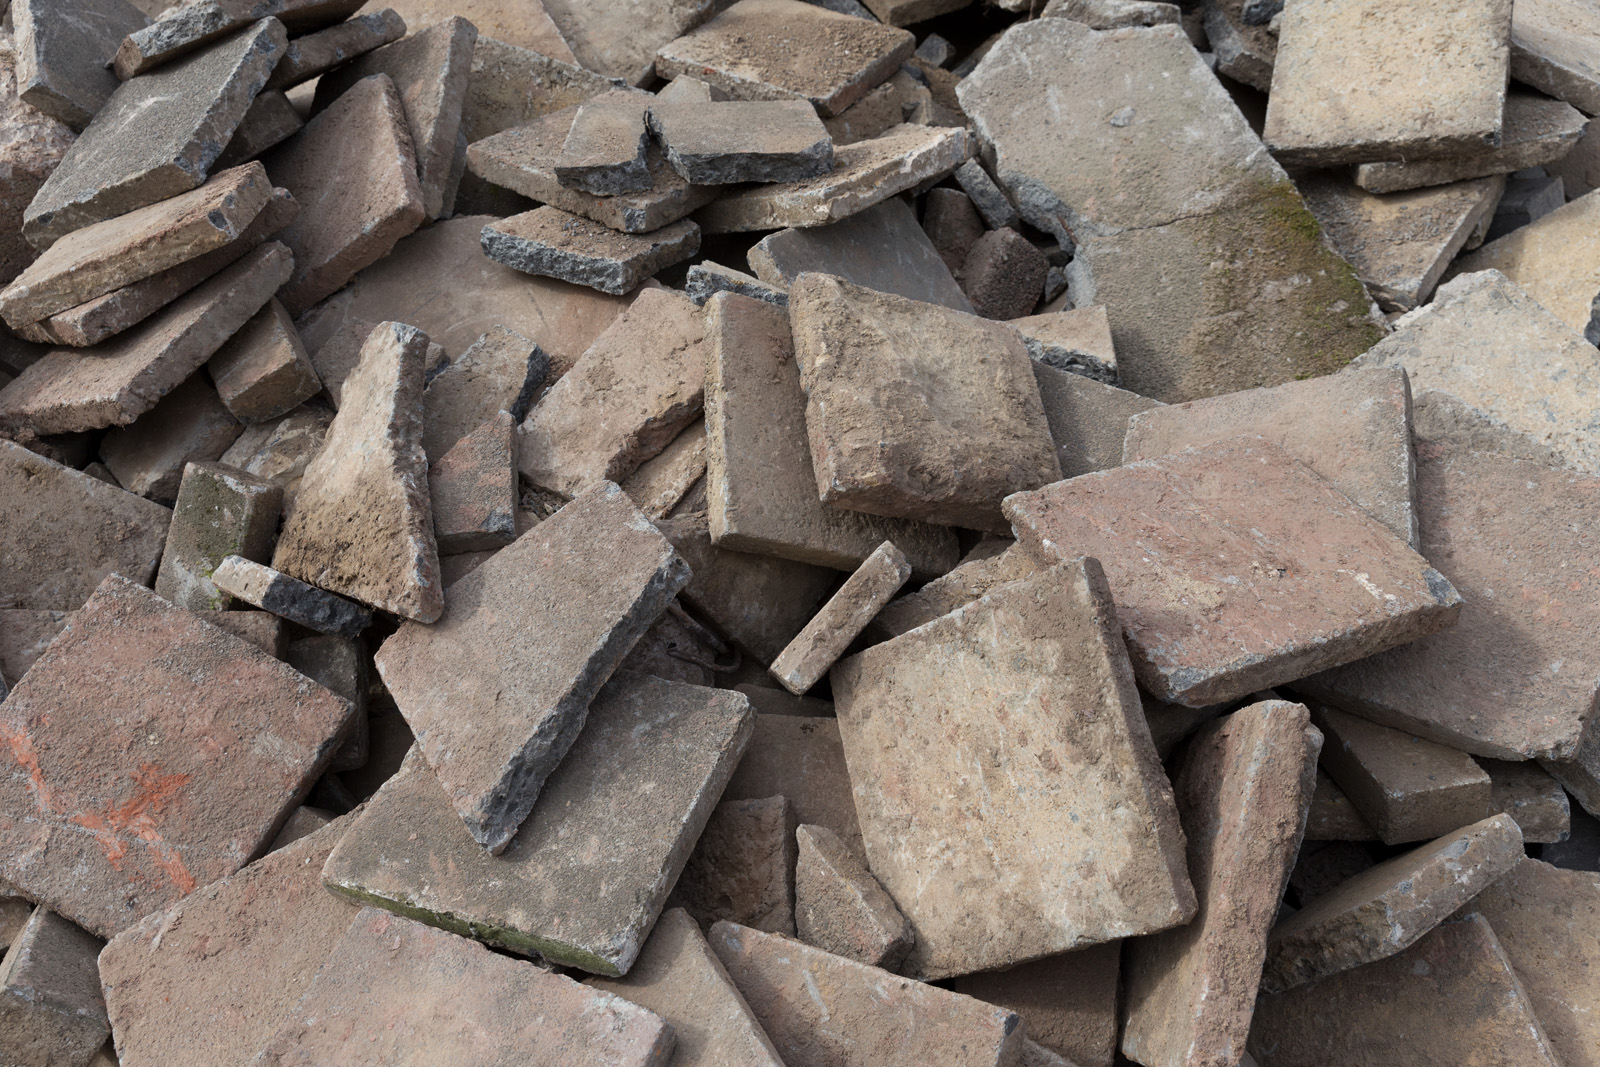 Annahme von unbelastetem Beton/Stahlbeton, – Asphalt